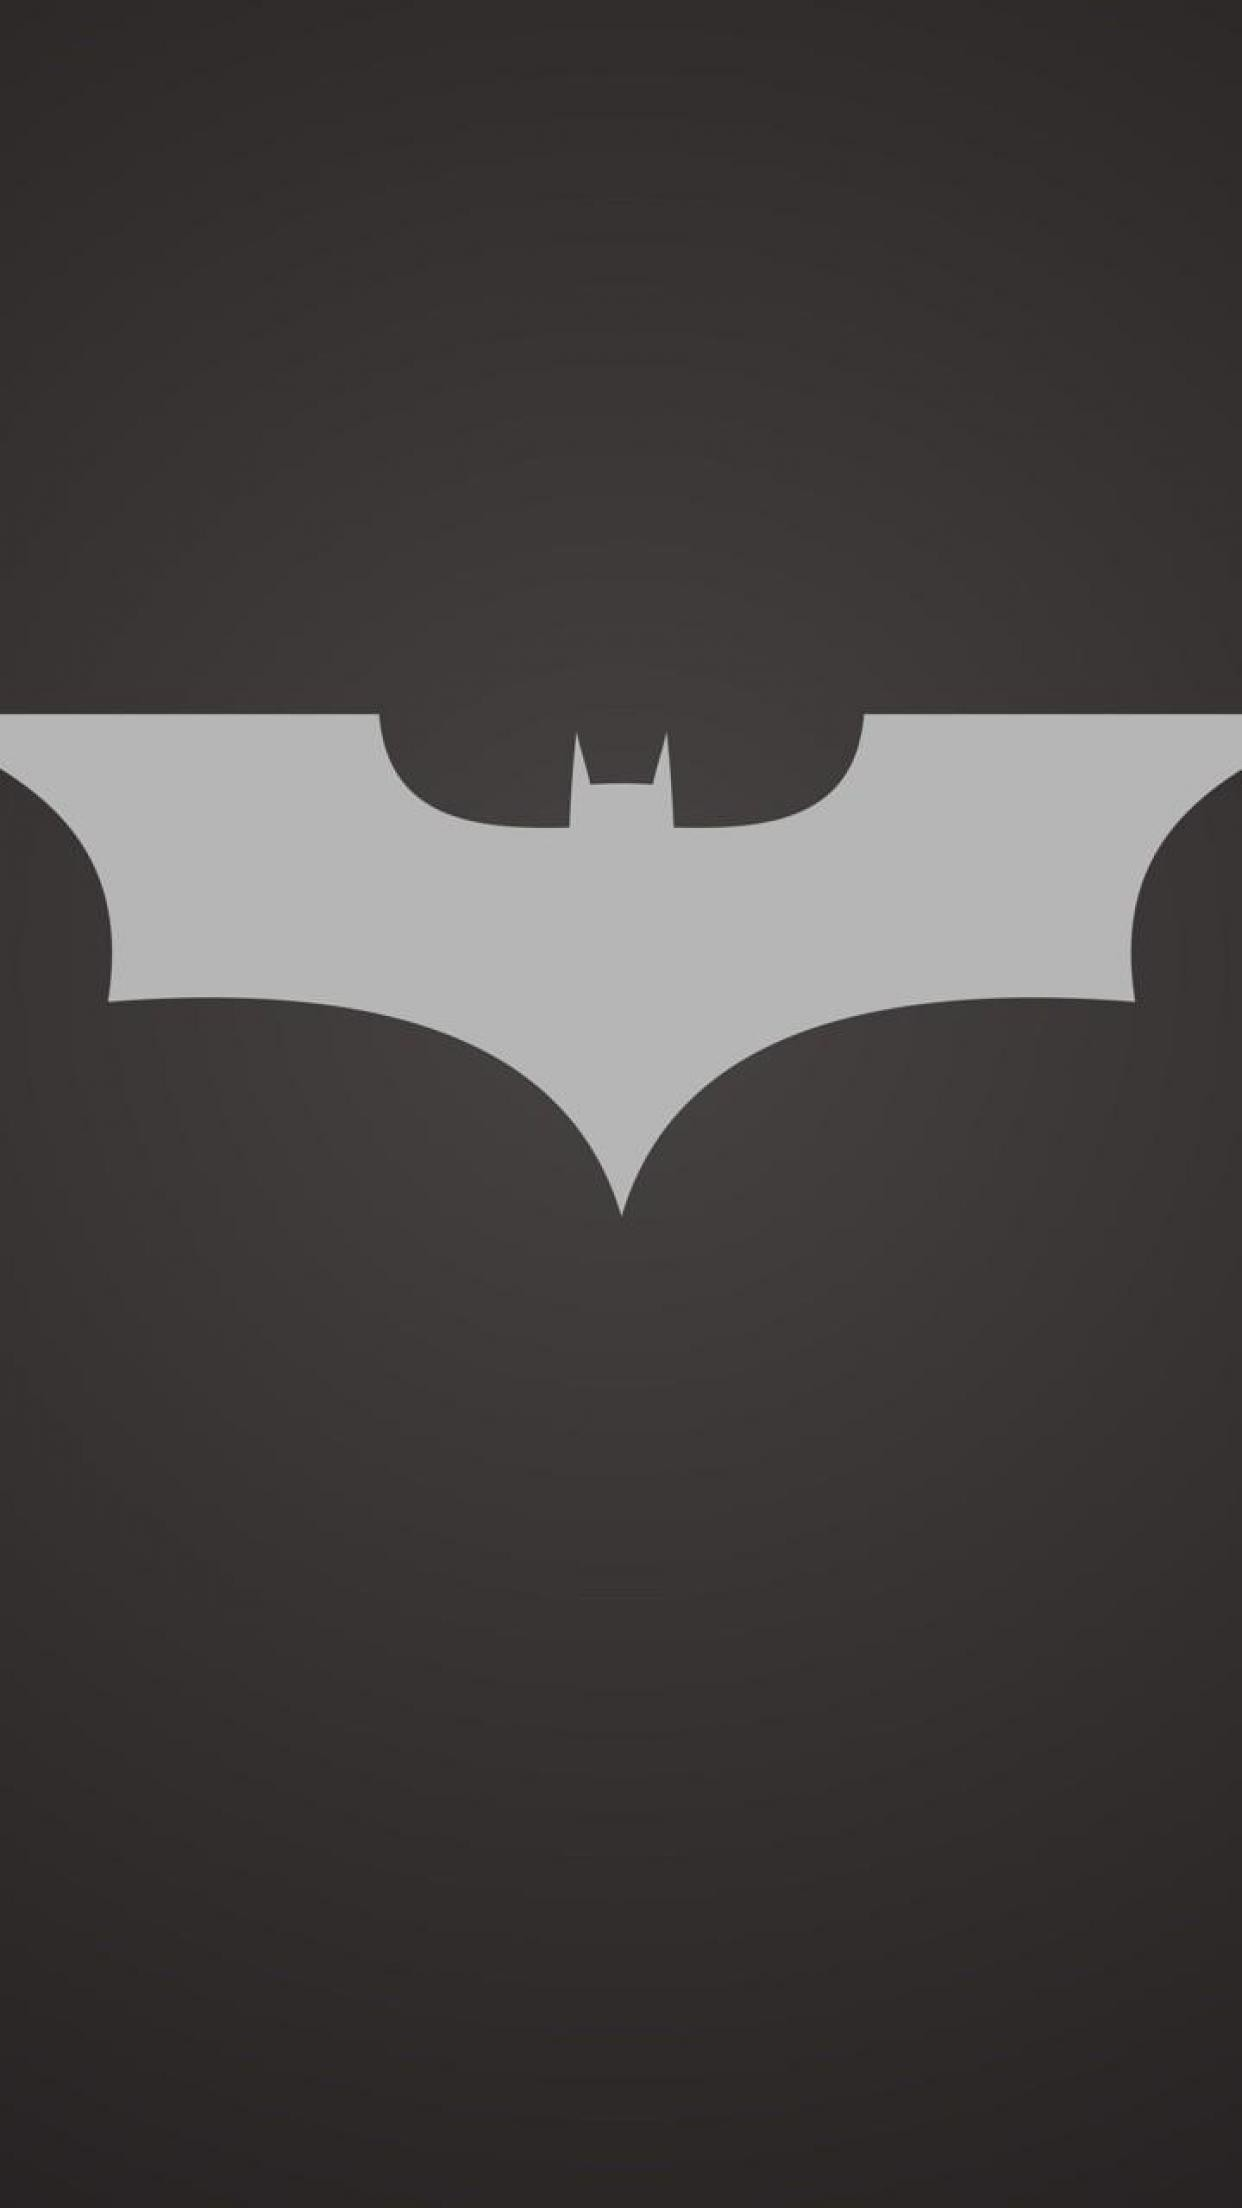 Batman Logo iPhone Wallpapers Free Download.